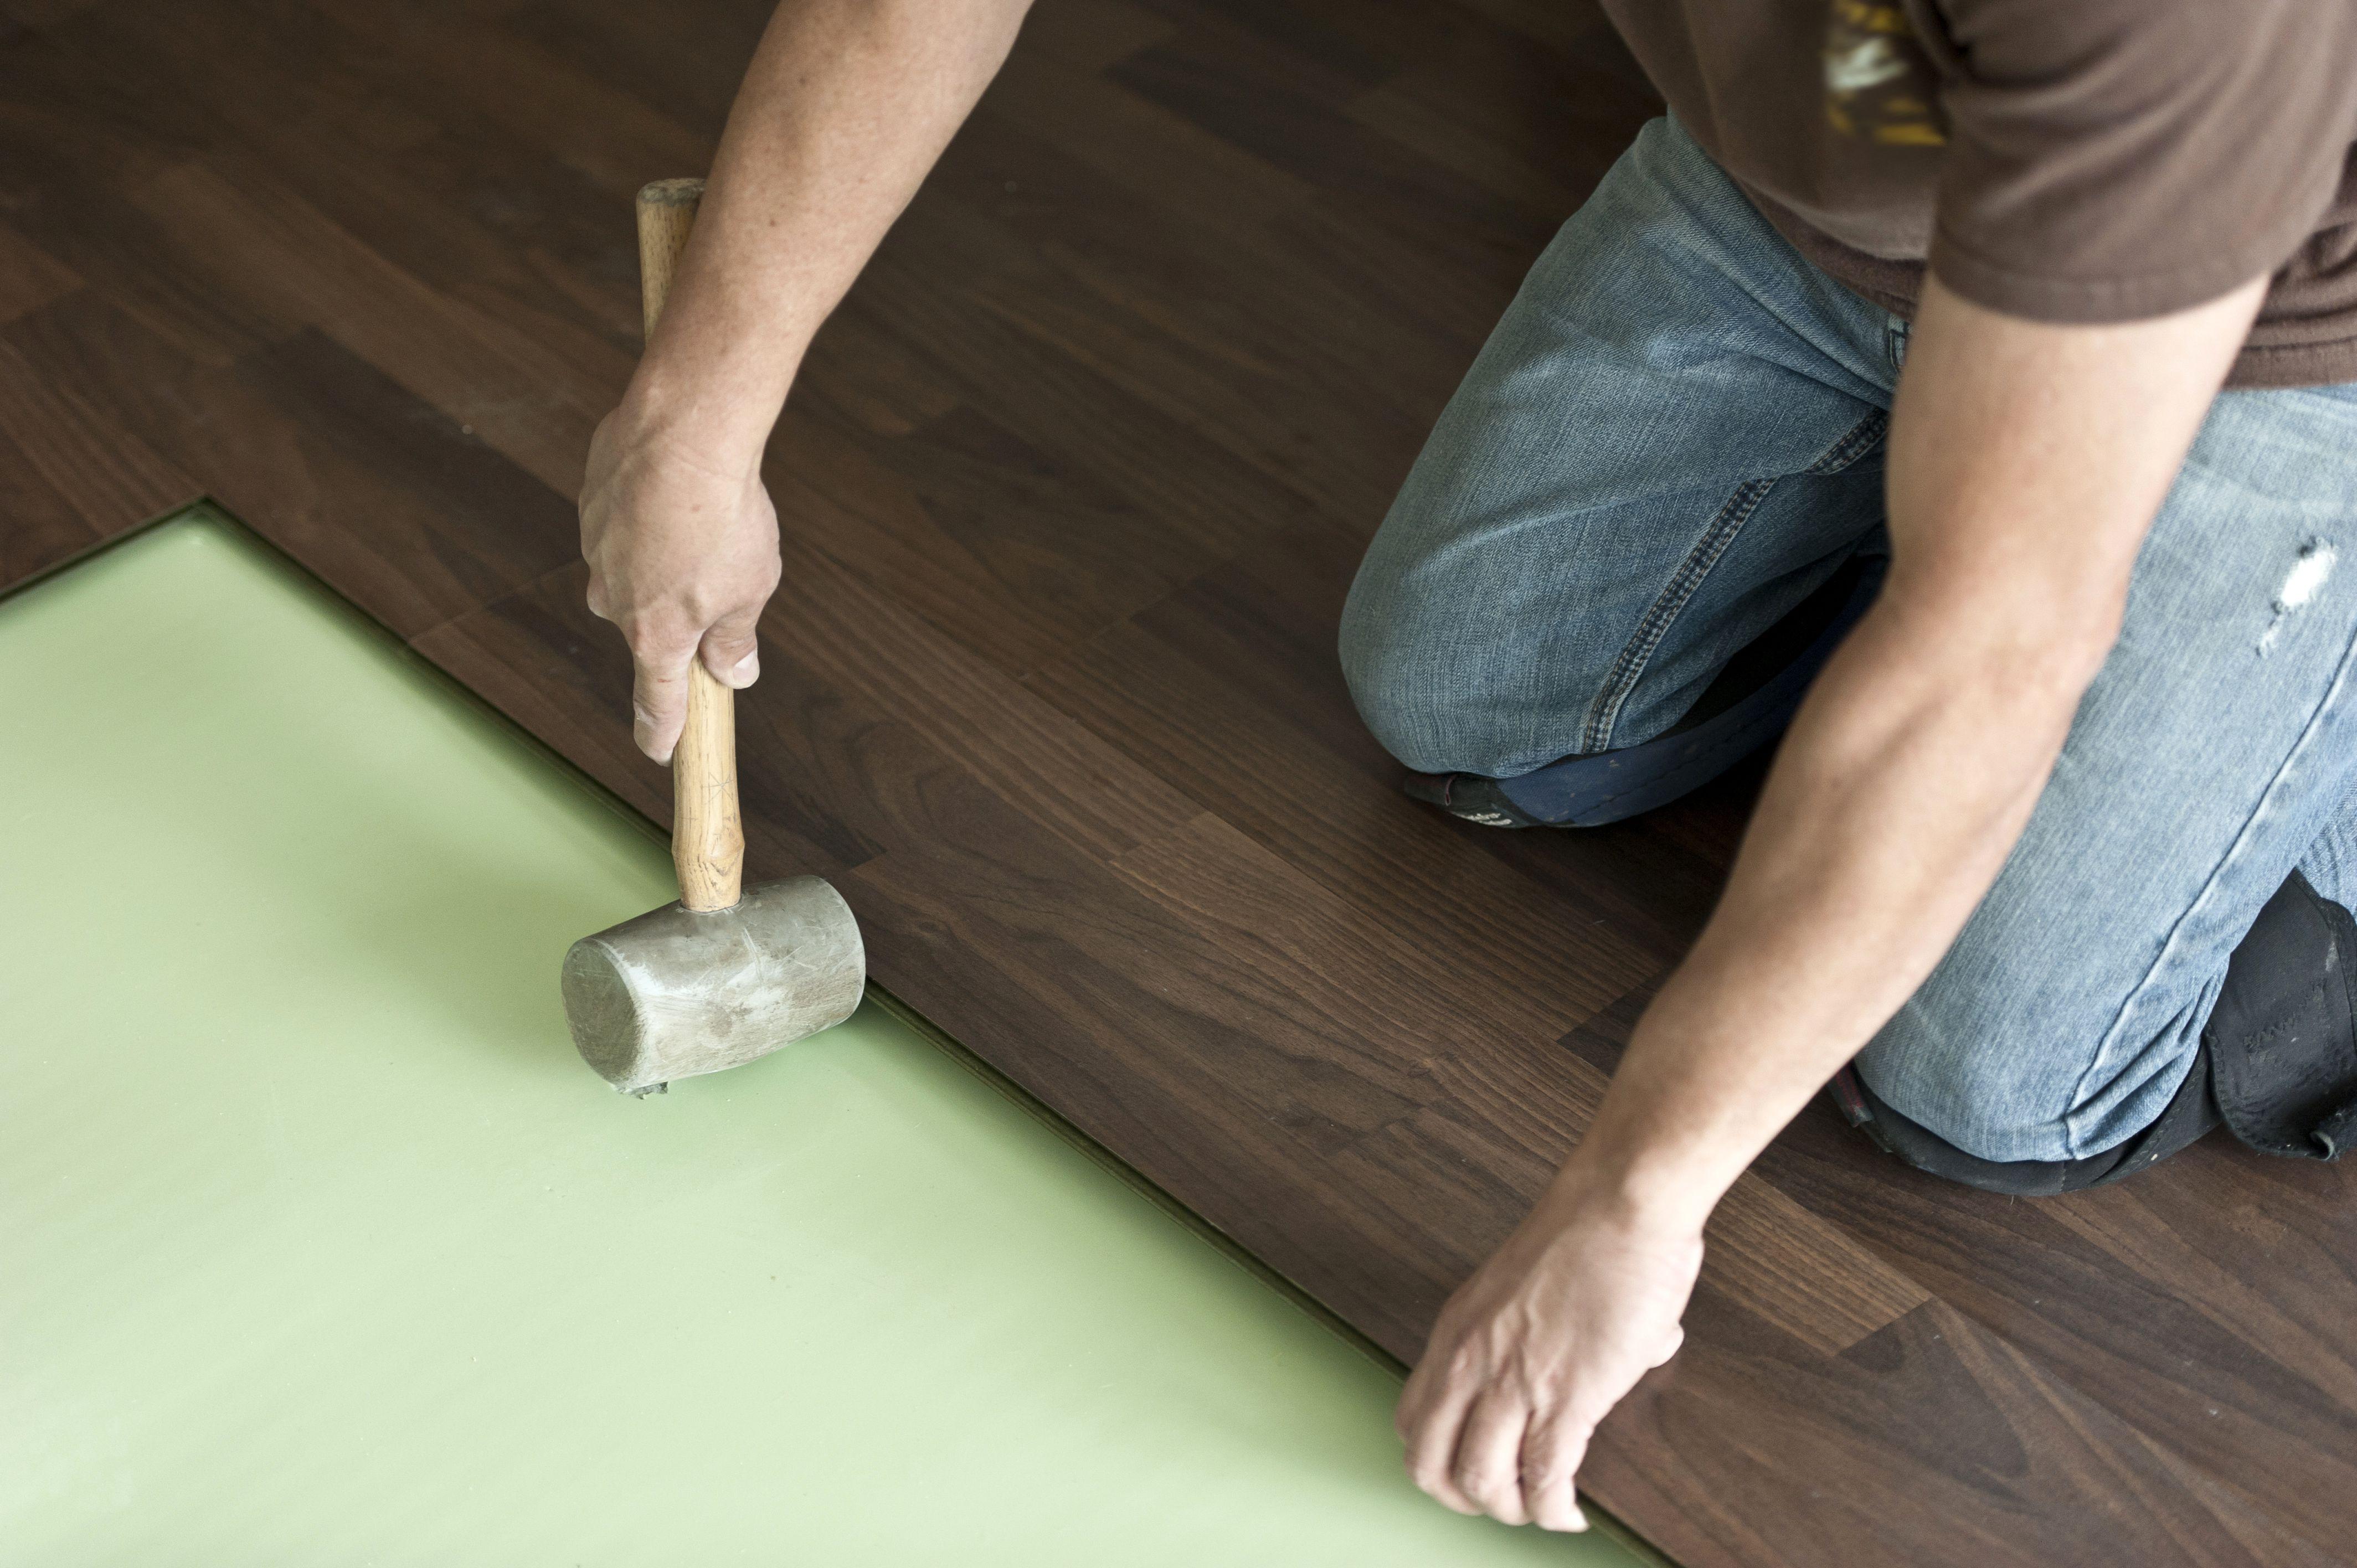 1 2 inch hardwood flooring of can a foam pad be use under solid hardwood flooring inside installing hardwood floor 155149312 57e967d45f9b586c35ade84a